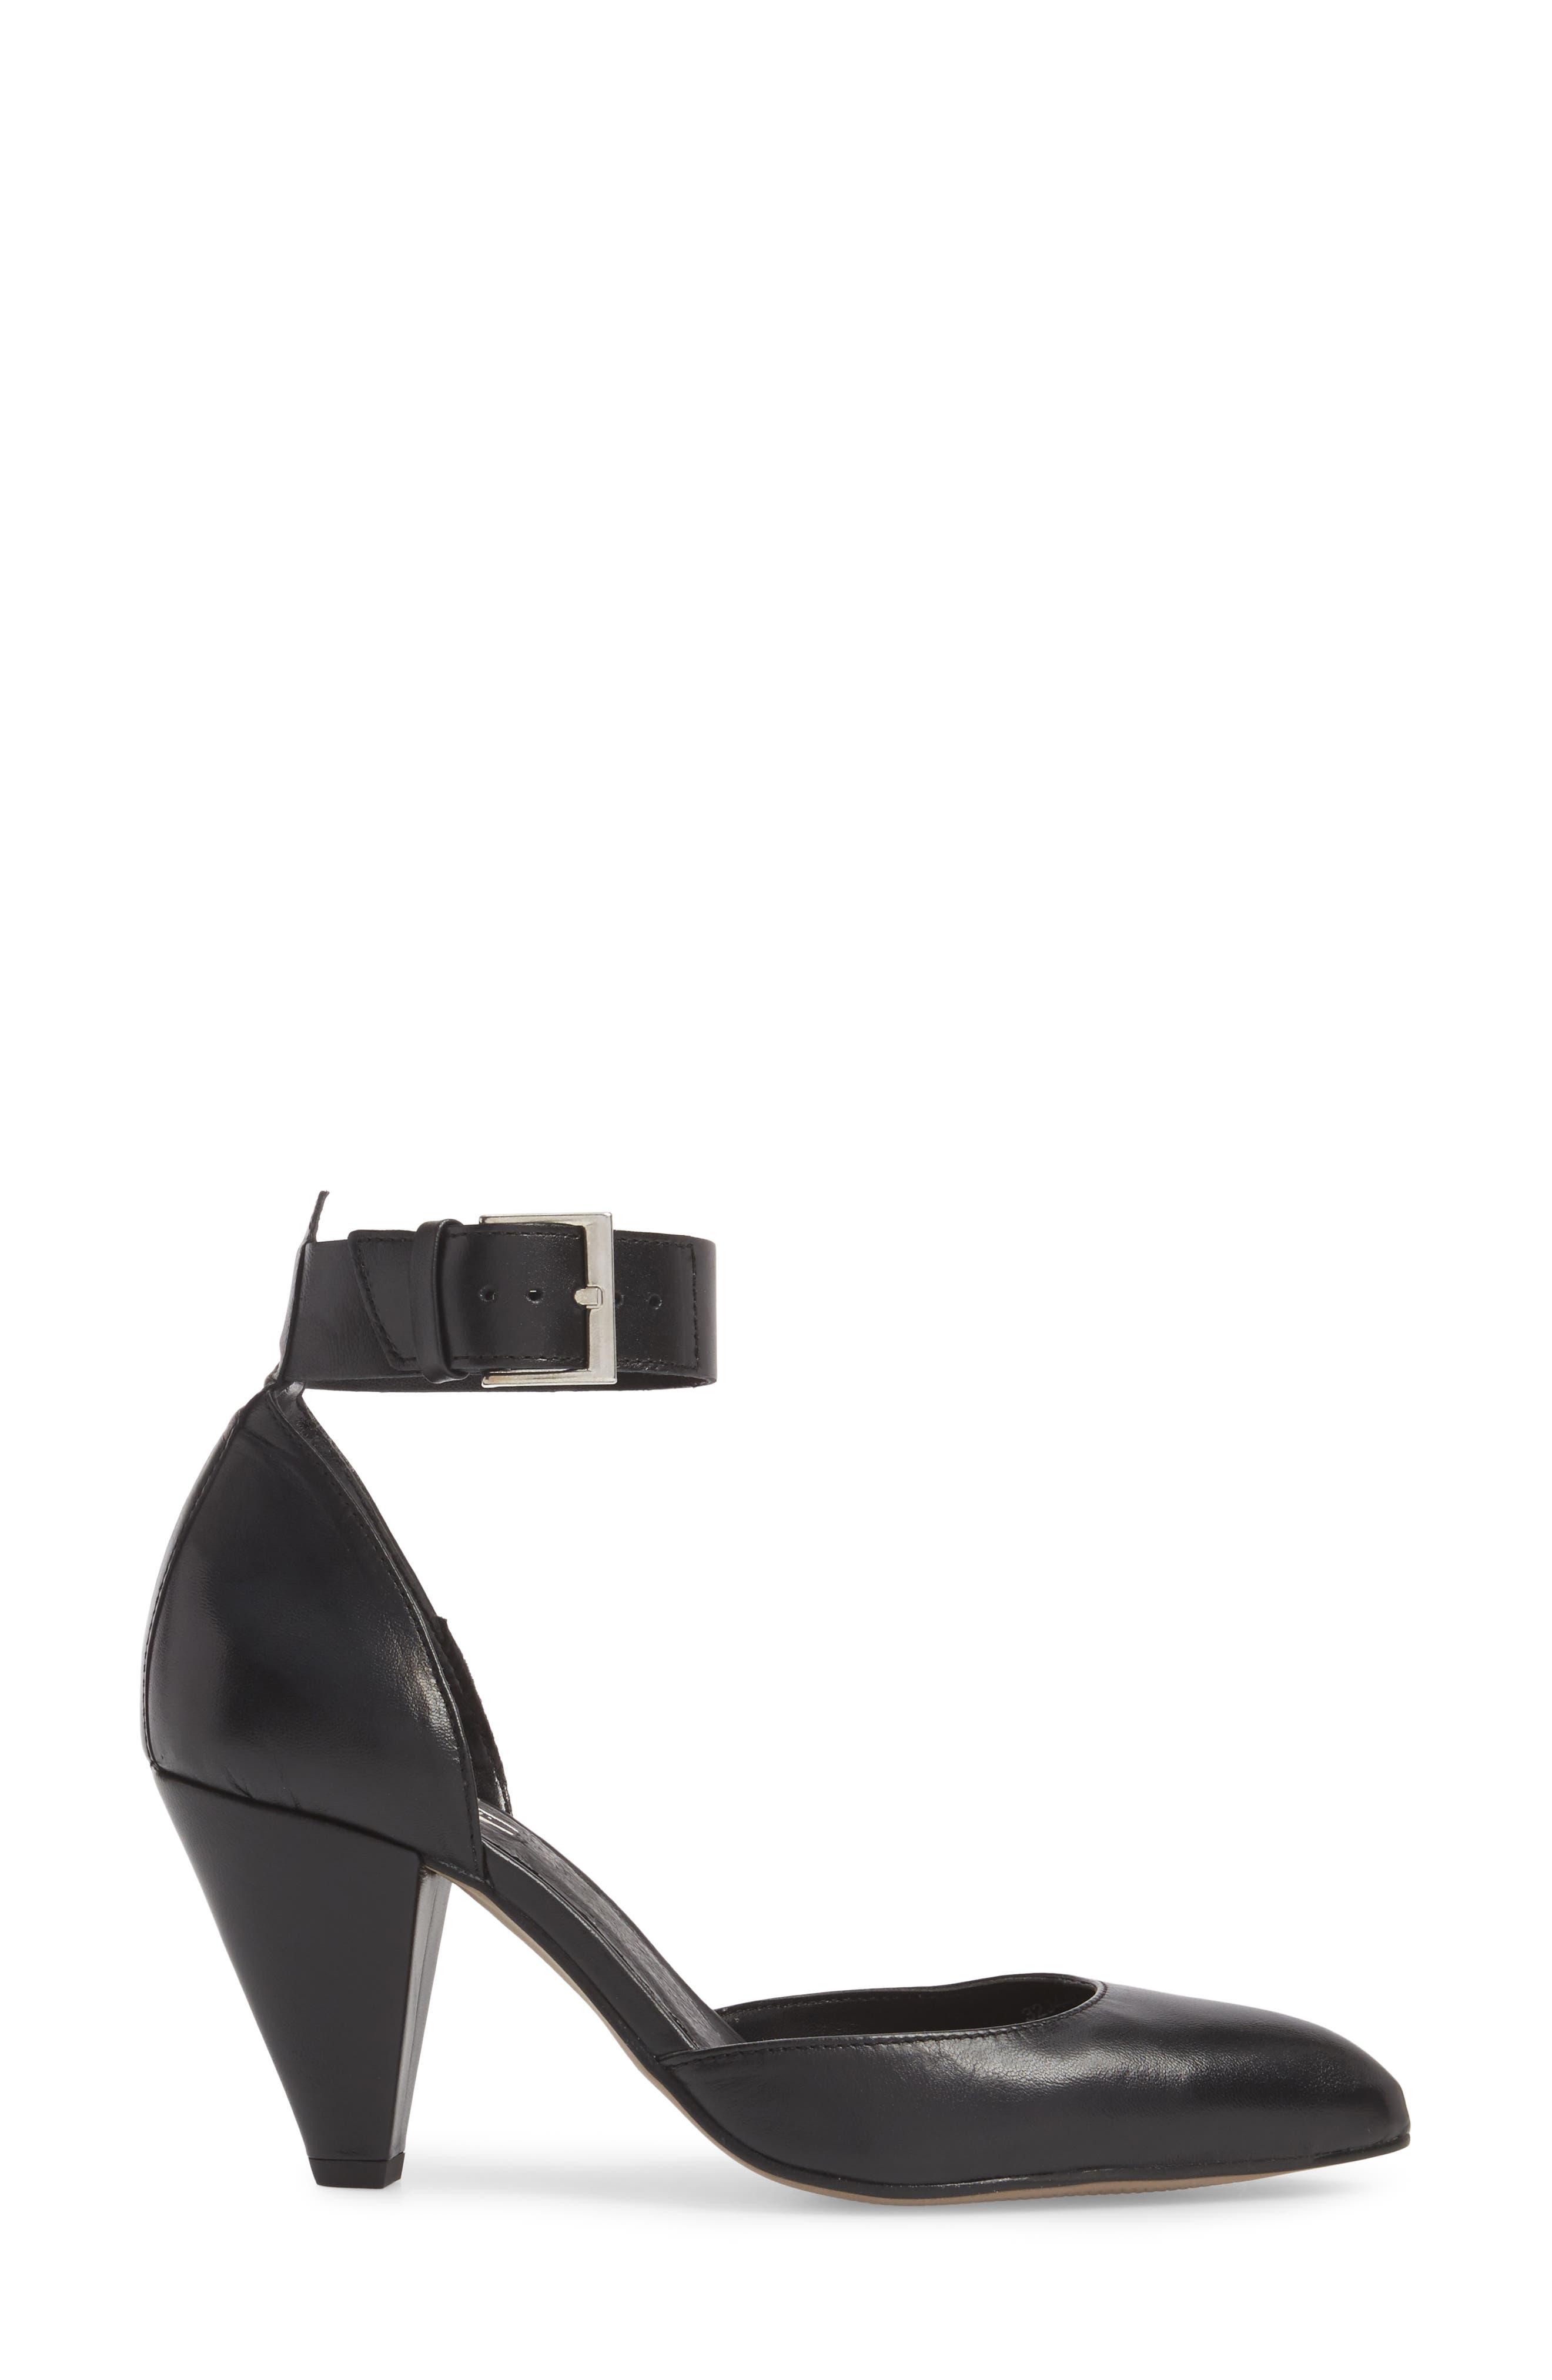 Jazzie Ankle Strap d'Orsay Pump,                             Alternate thumbnail 3, color,                             BLACK